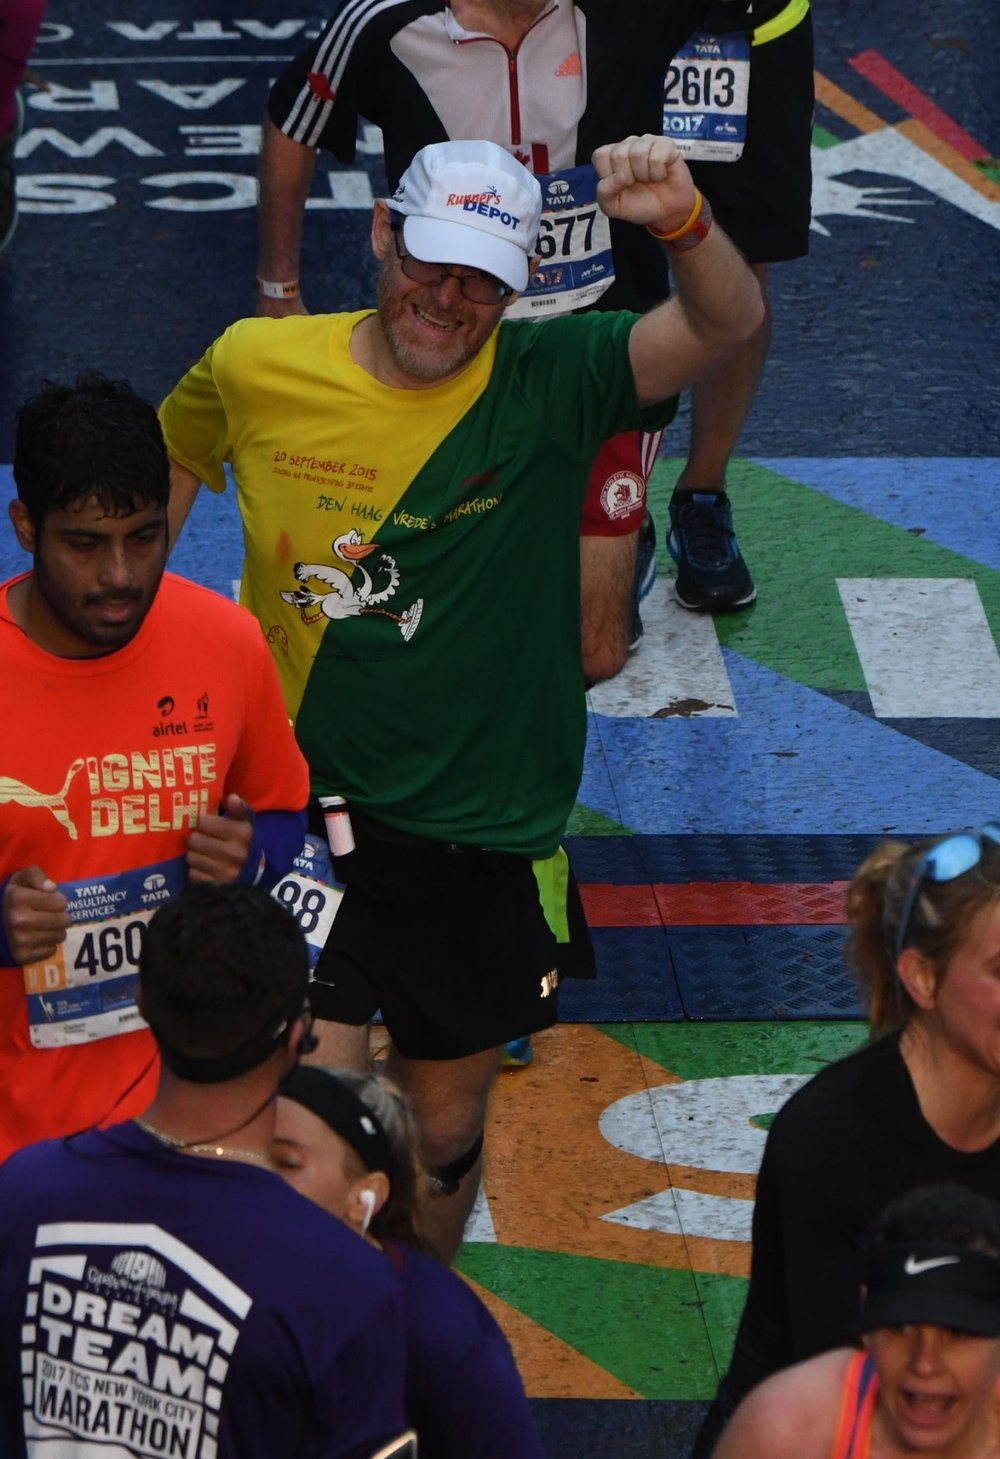 nyc-marathon-2017-finish.jpg